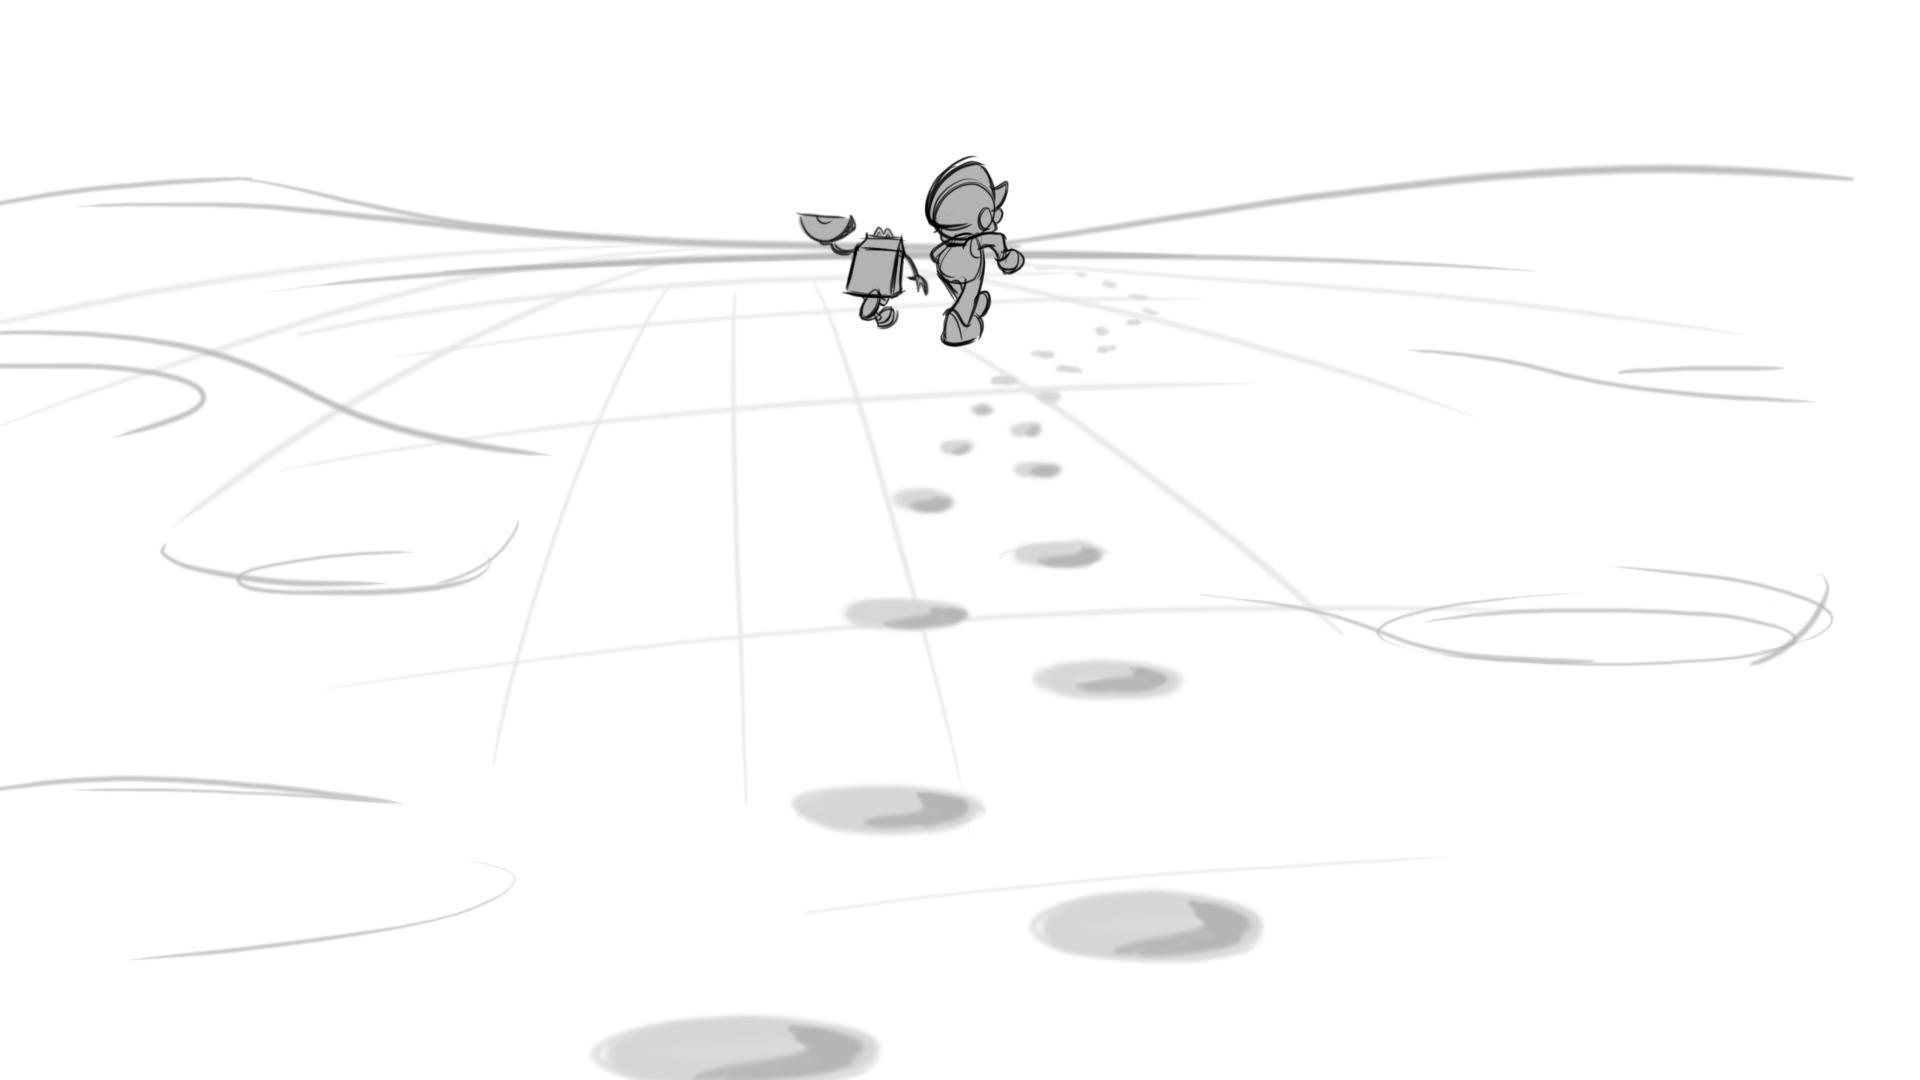 Mario-14-04.jpg